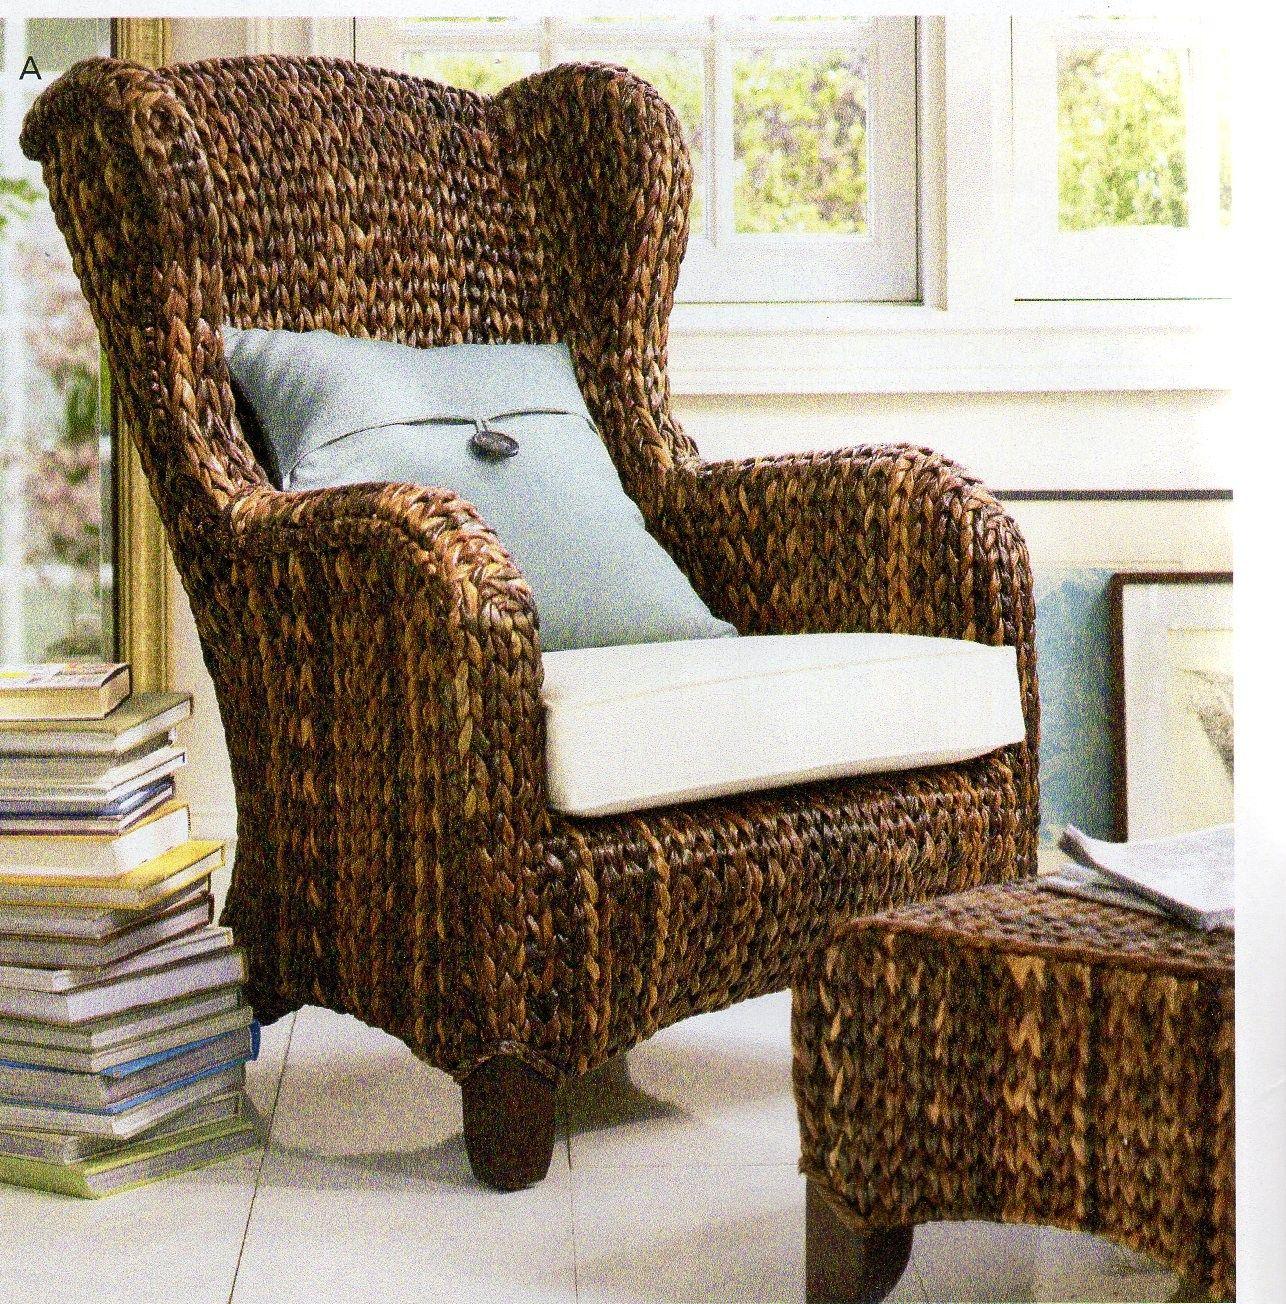 Pottery Barn Wicker Chairs